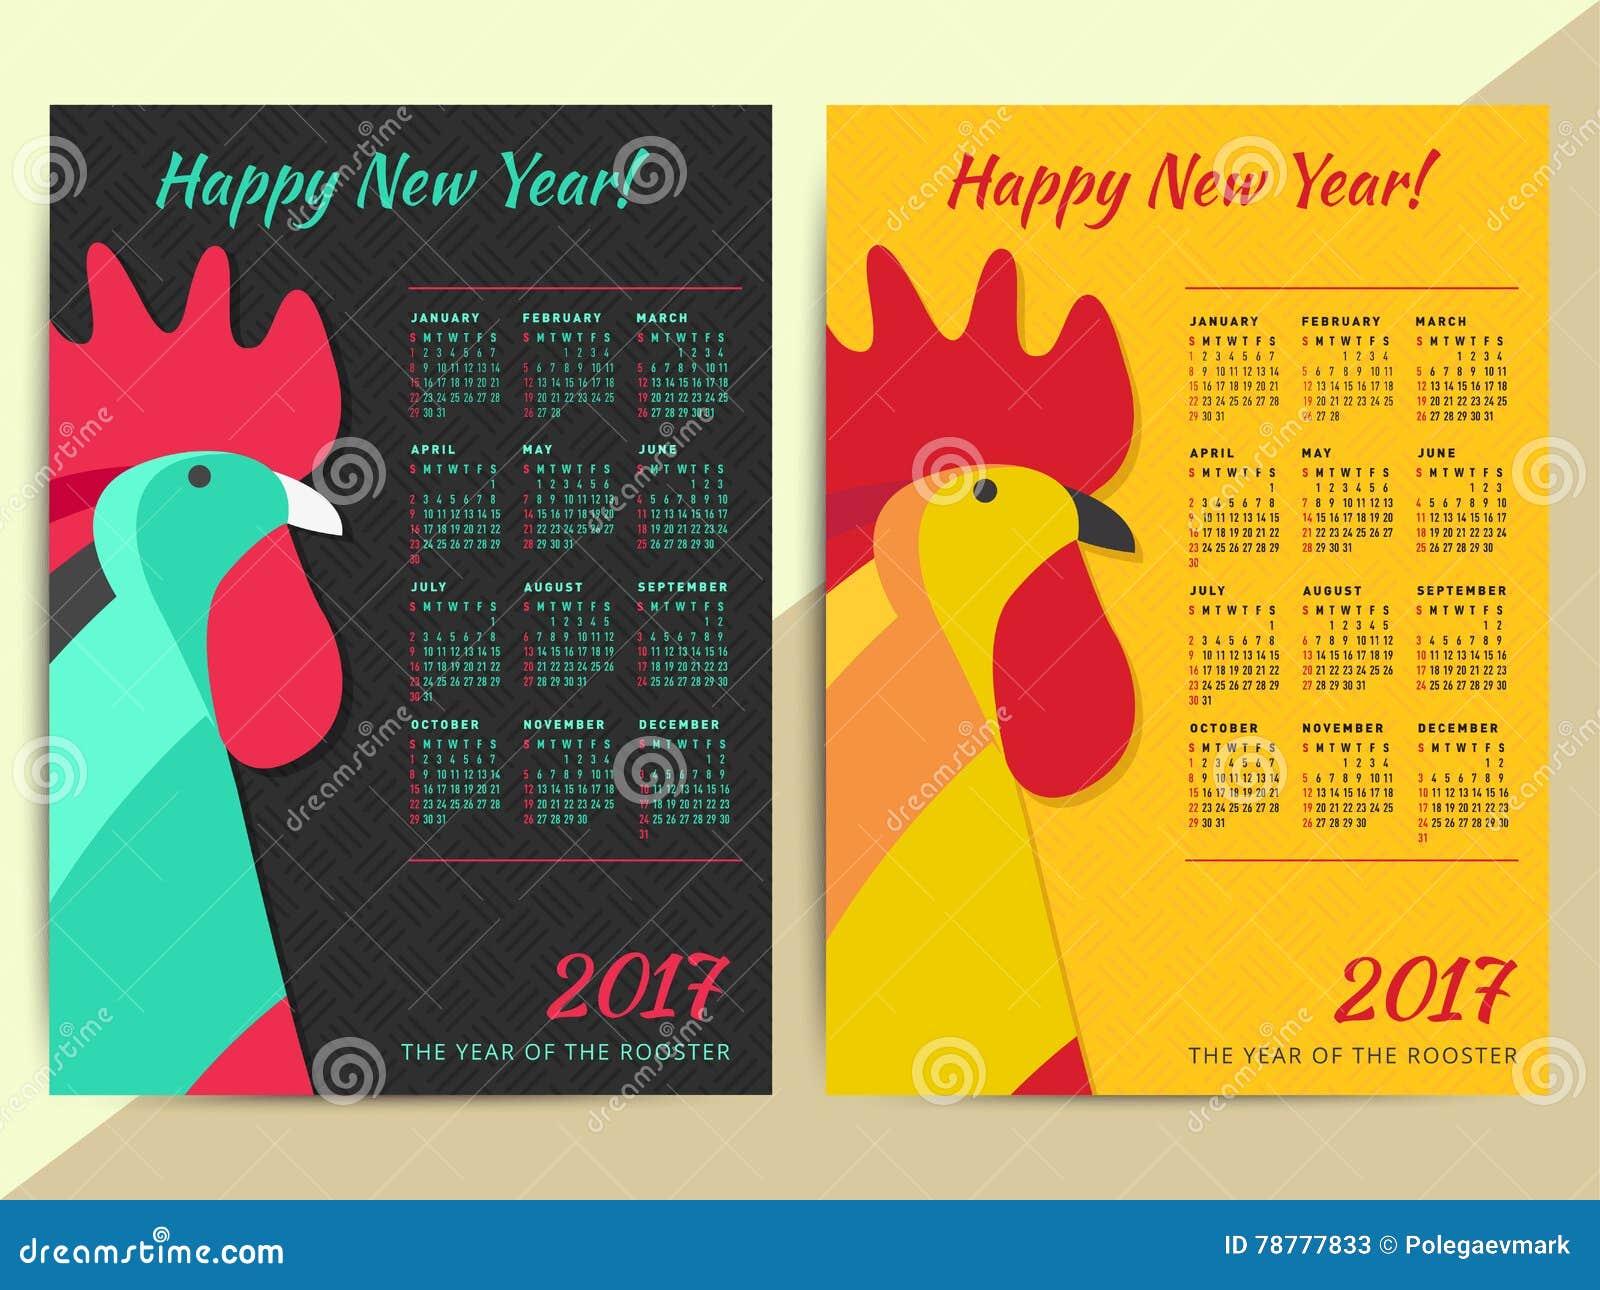 Chinese Calendar Illustration : Chinese horoscope rooster symbol creative calendar